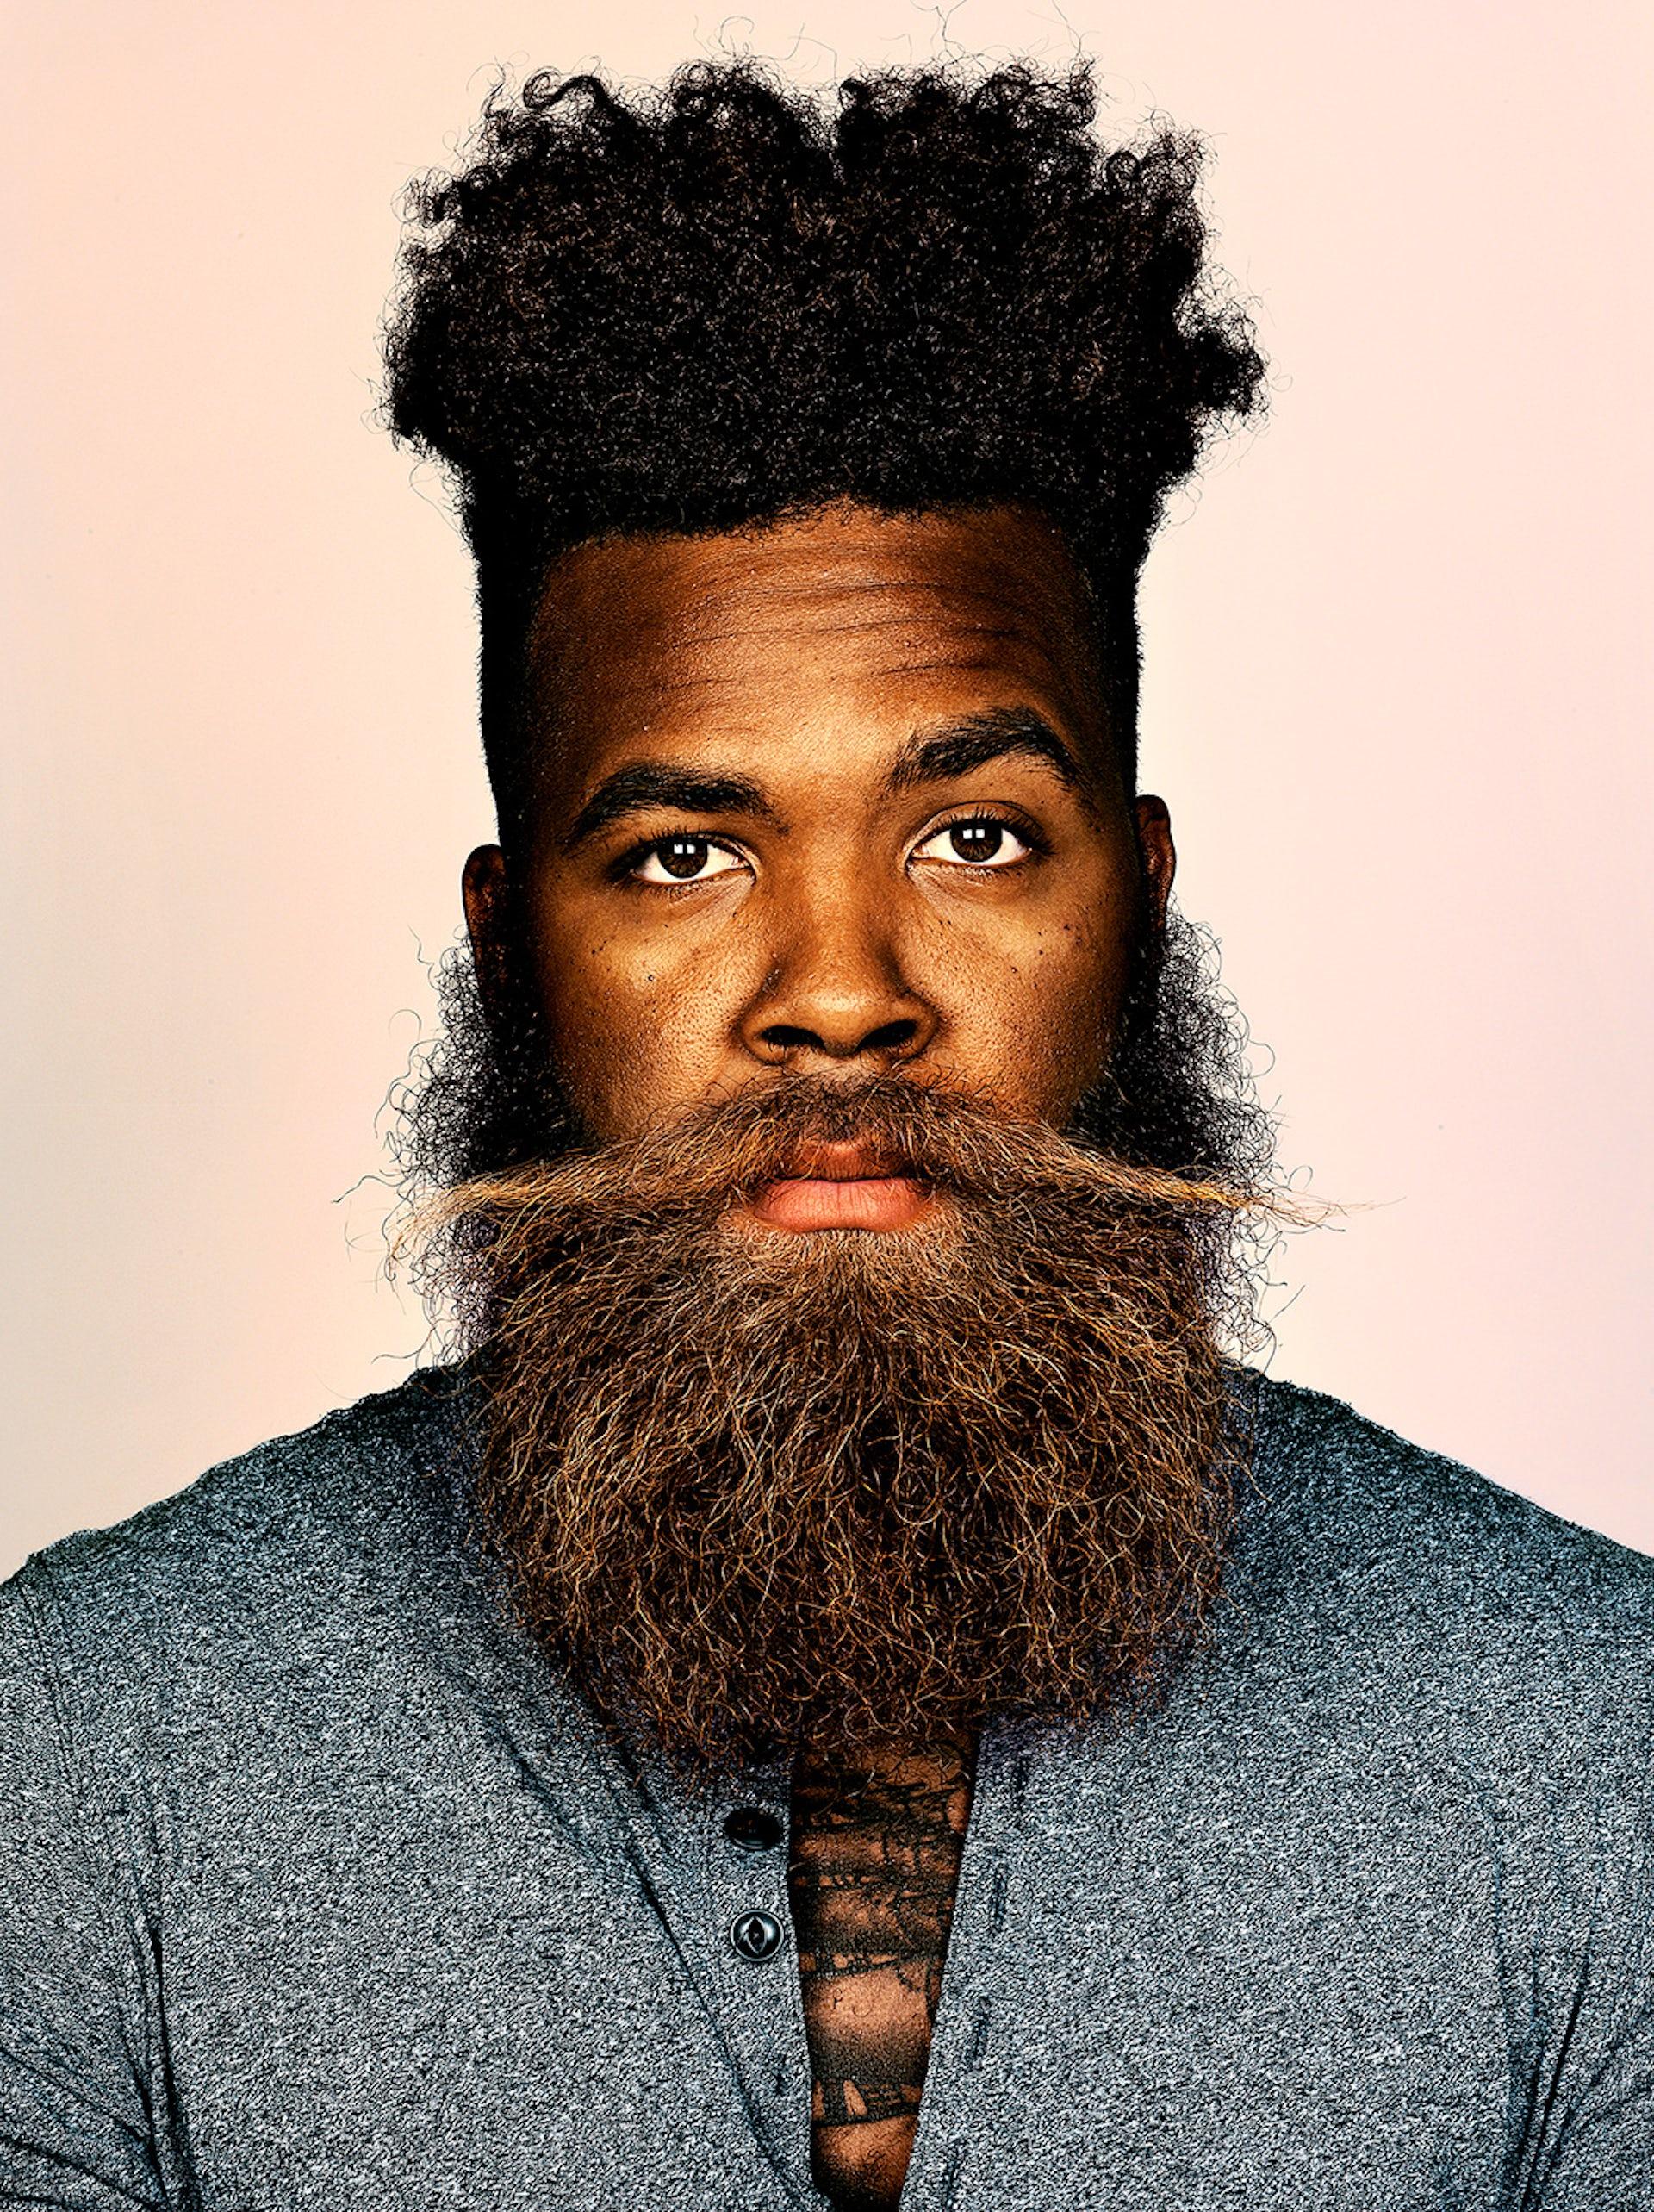 Beards are intimidatingly